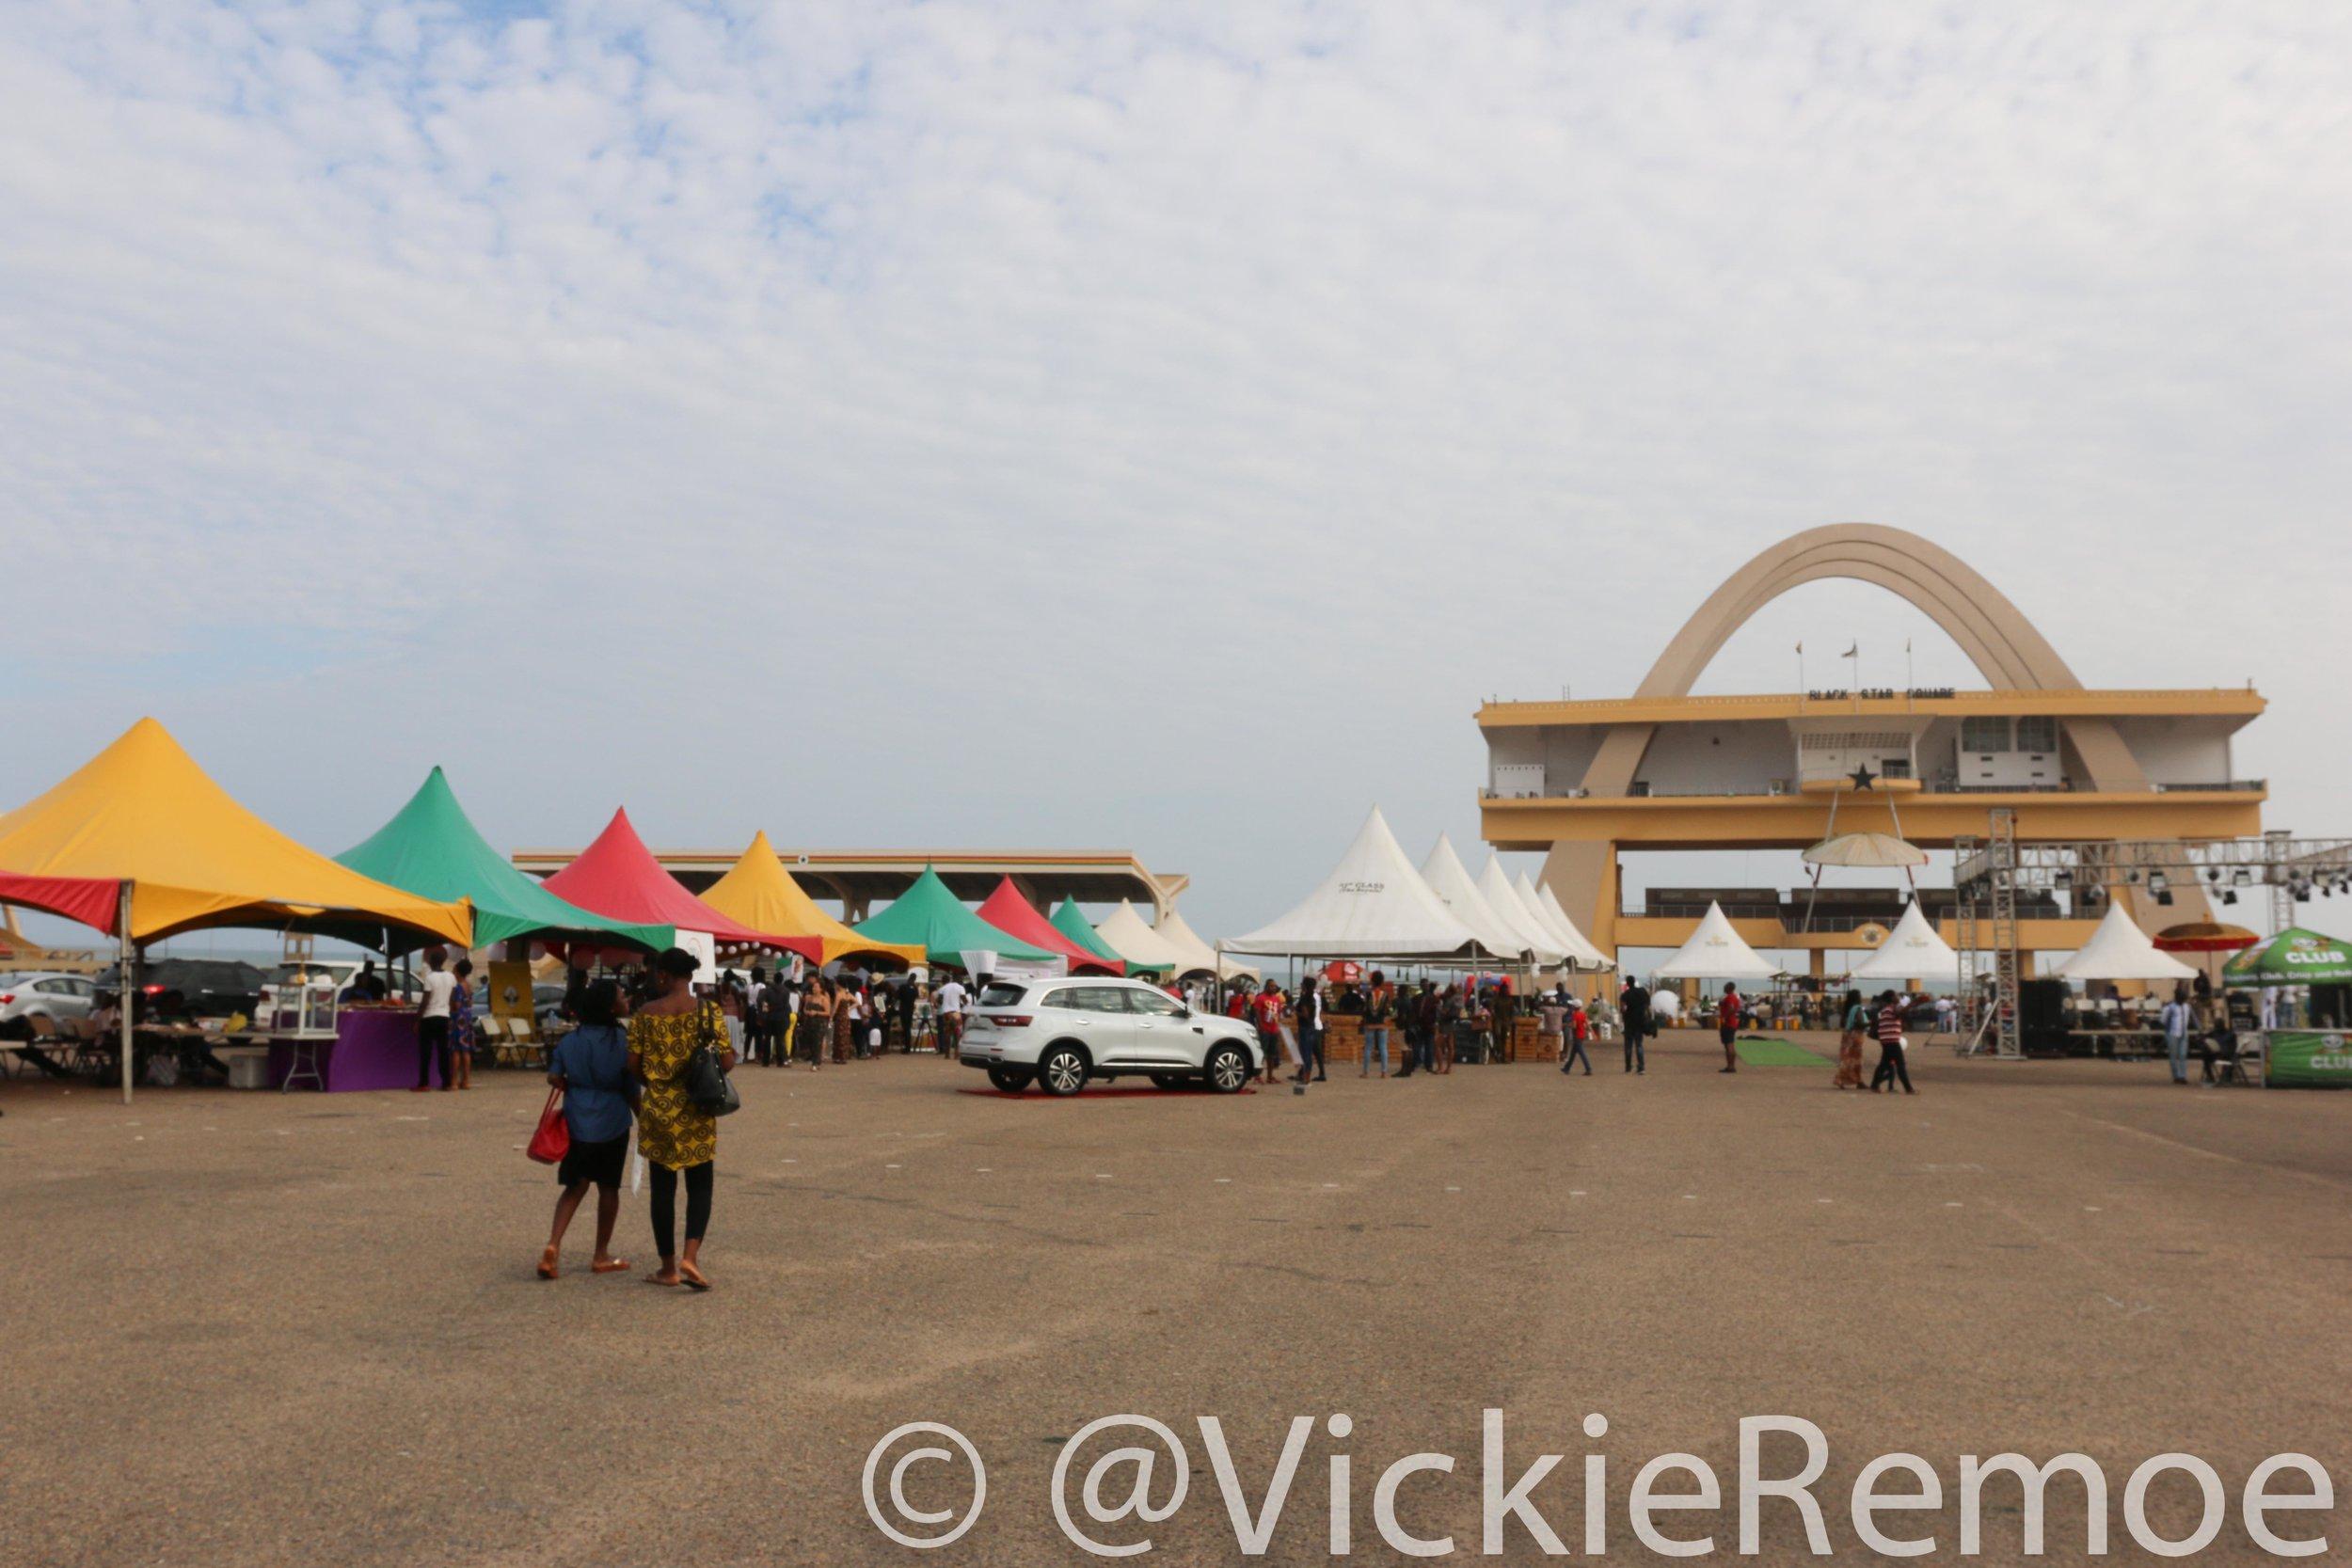 AccraFoodFestival-VickieRemoeBlog-Ghana1.jpg